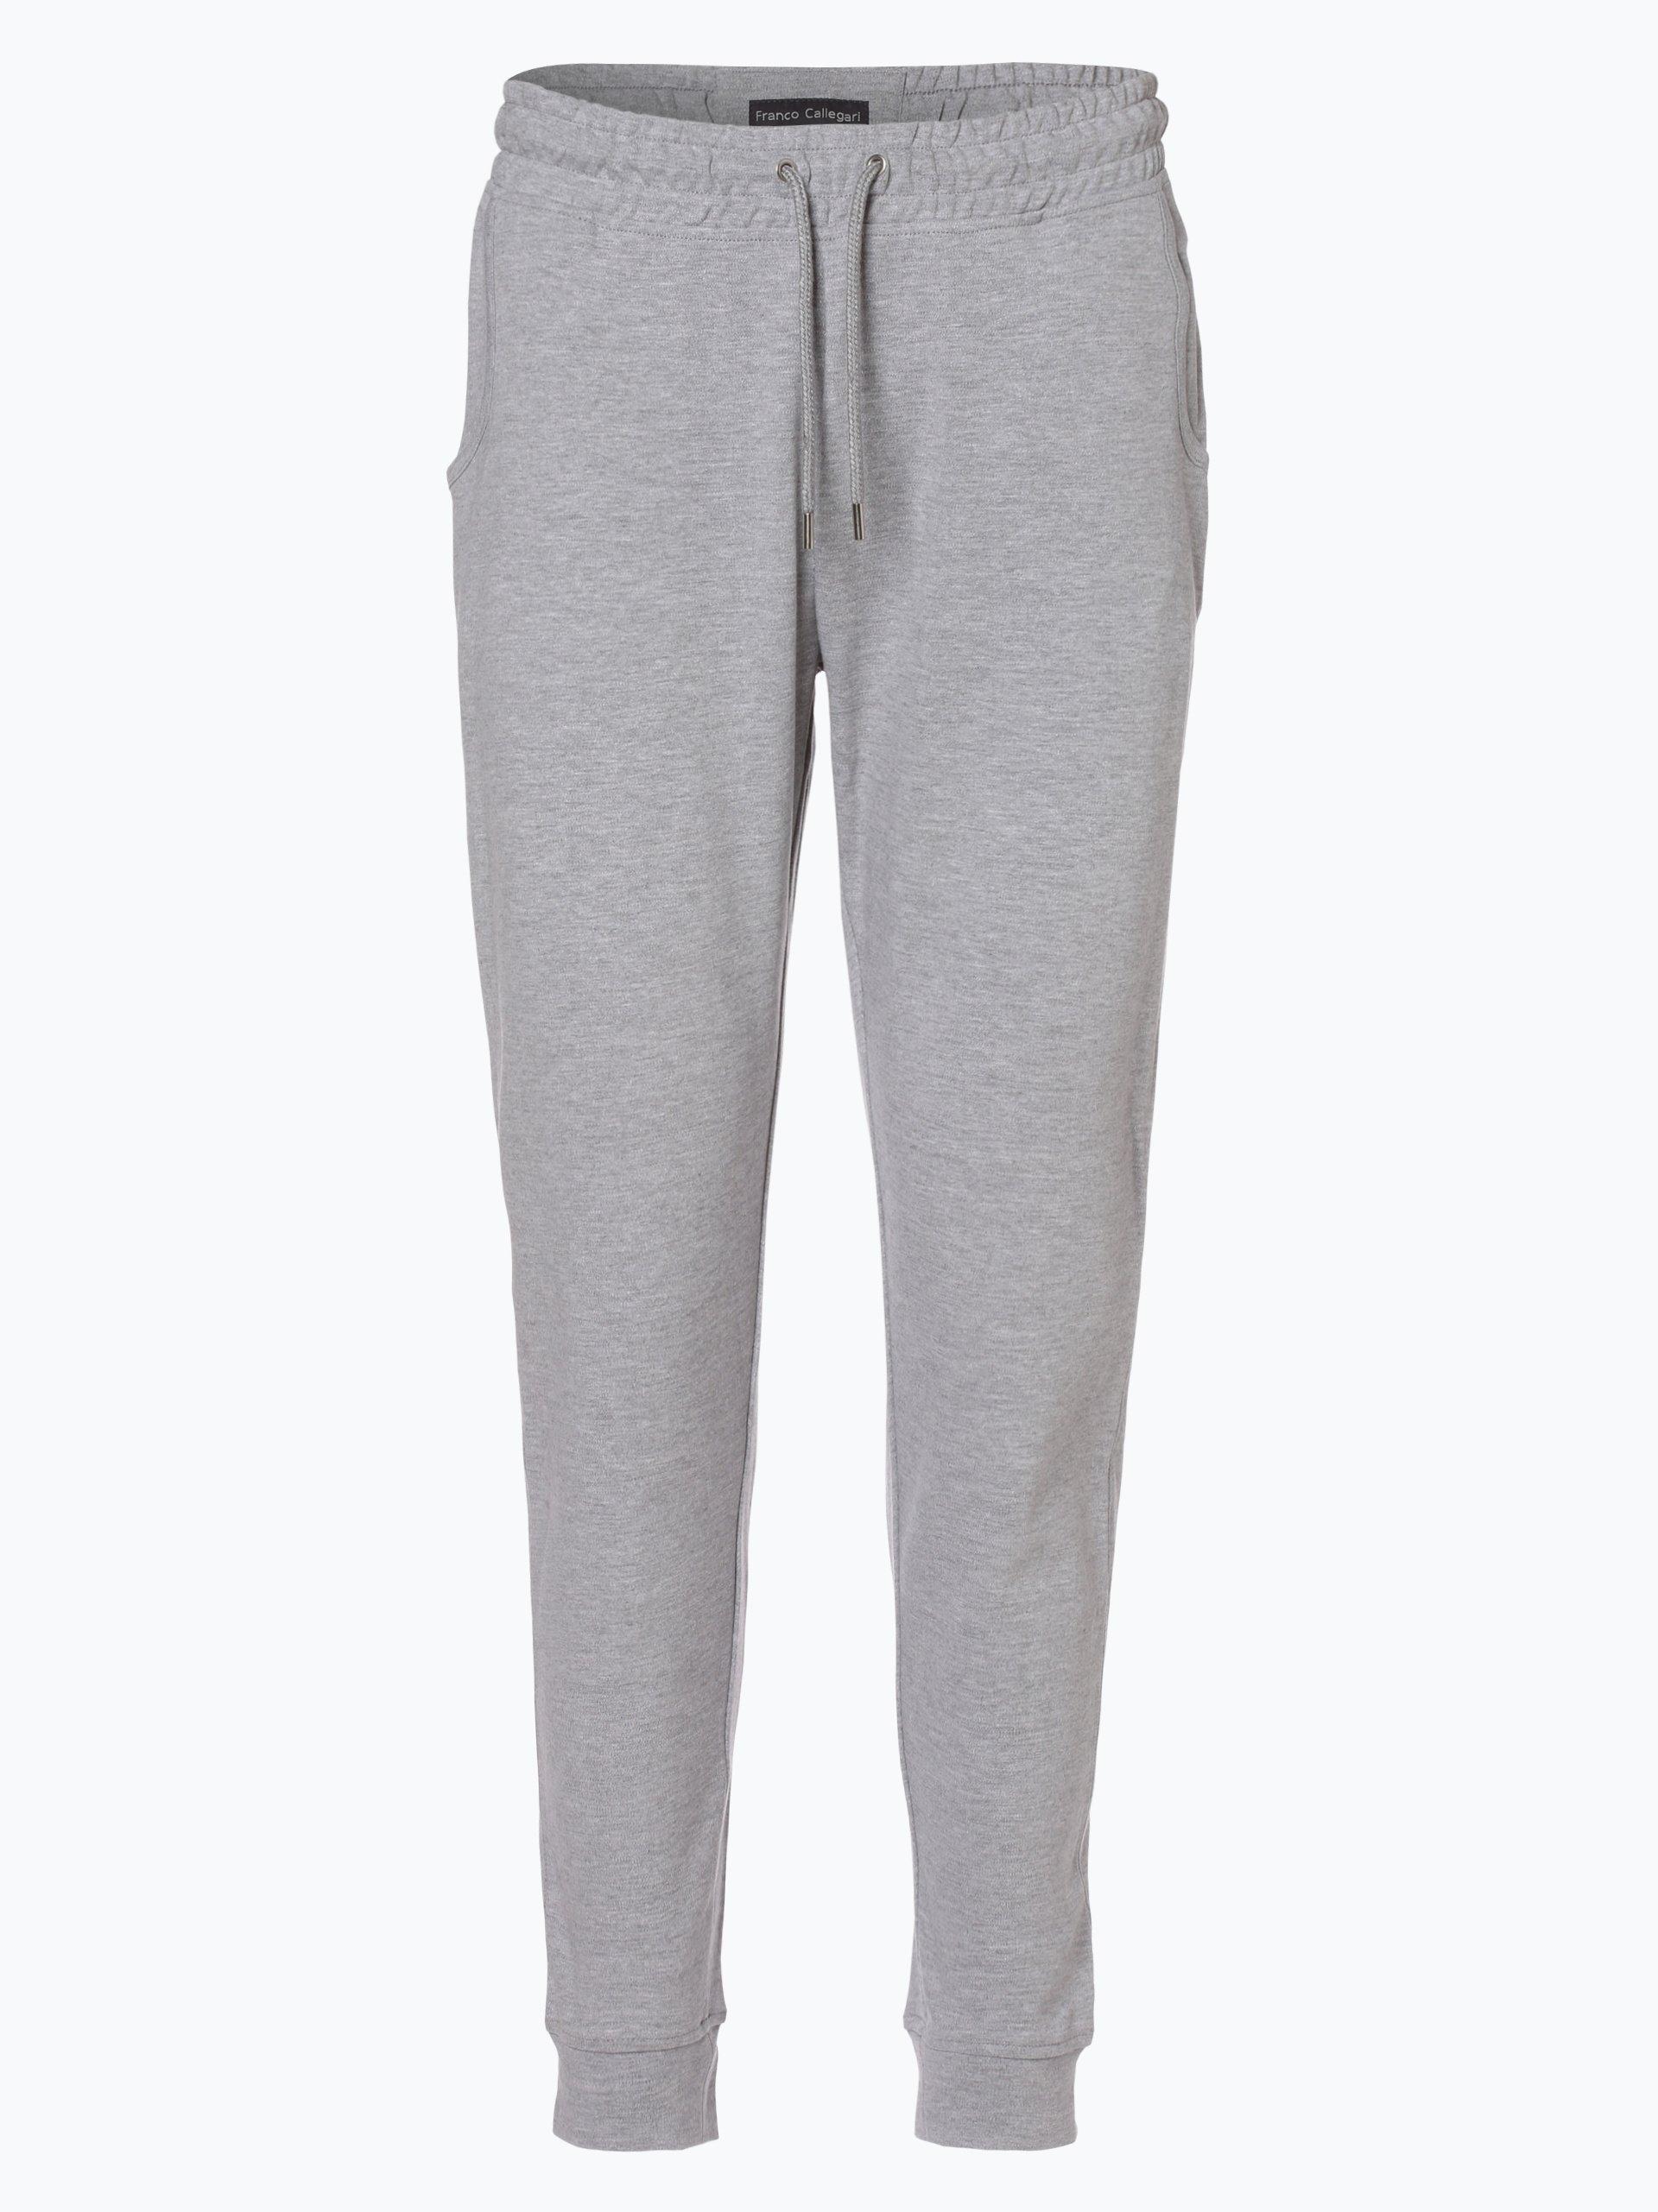 Franco Callegari Damskie spodnie dresowe